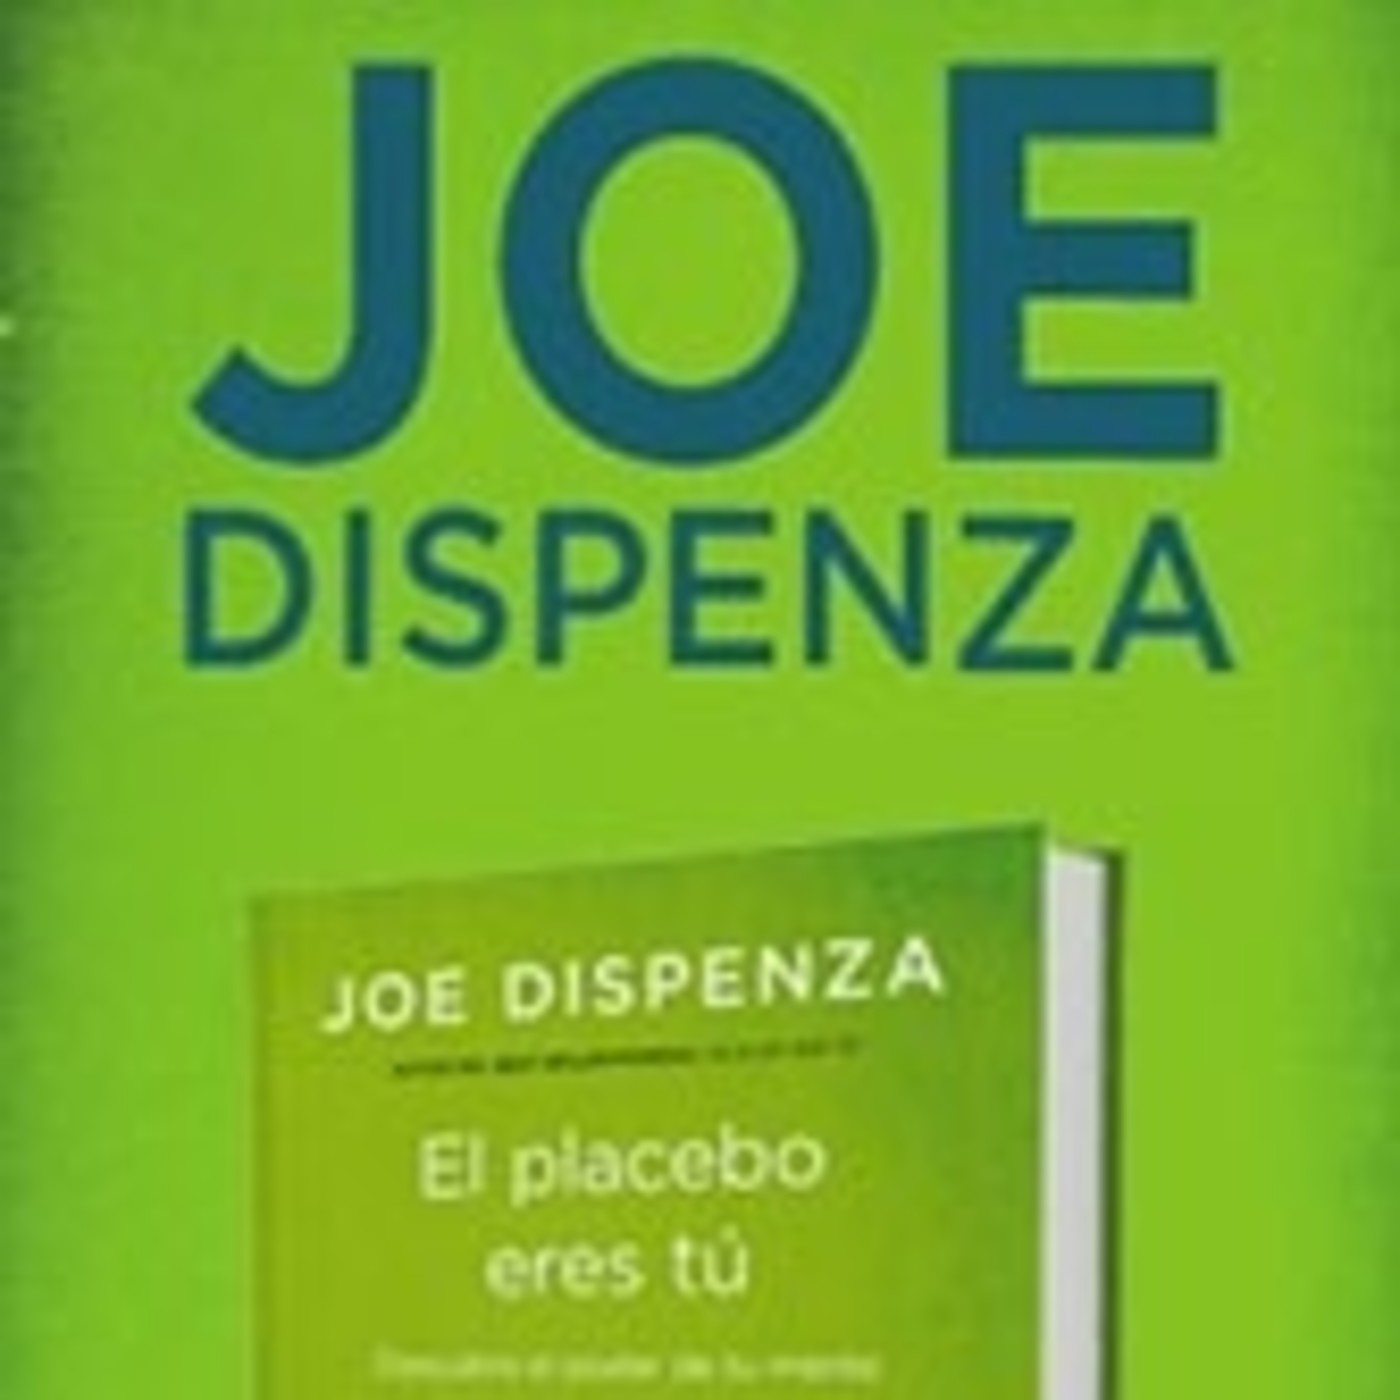 El placebo eres tu, Joe Dispenza Cap.1 en El placebo eres tu, Joe Dispensa  en mp3(08/11 a las 04:37:01) 53:38 21941620 - iVoox